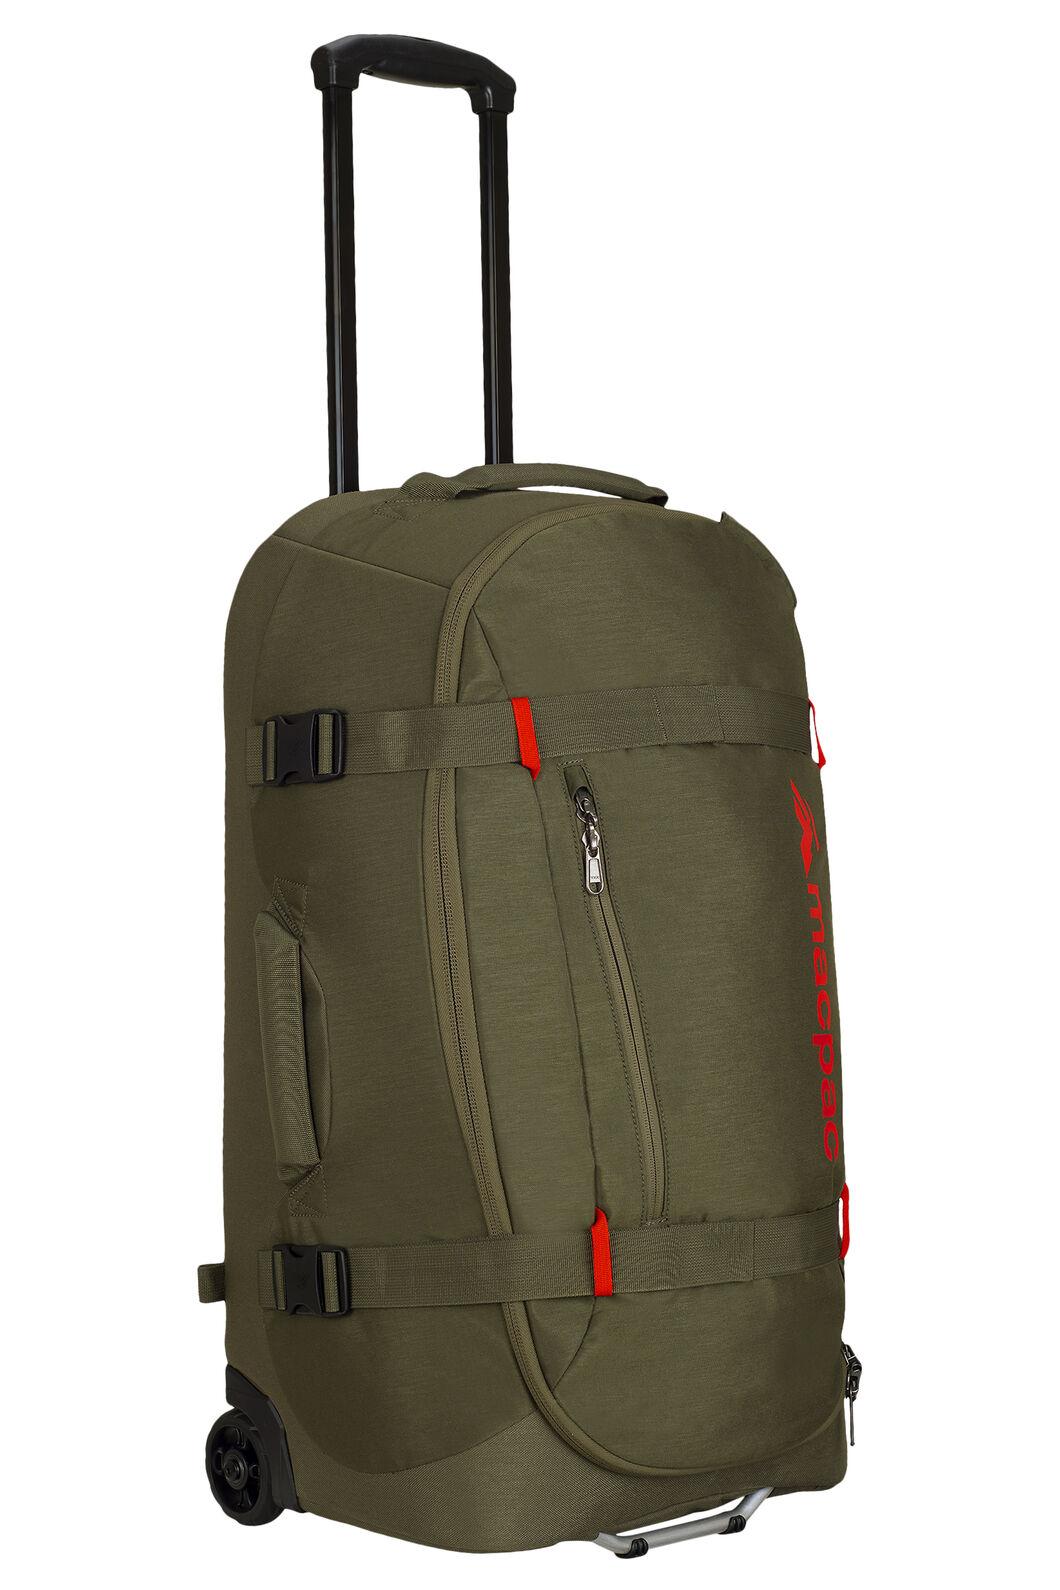 Macpac Global 55L Travel Bag, Grape Leaf, hi-res